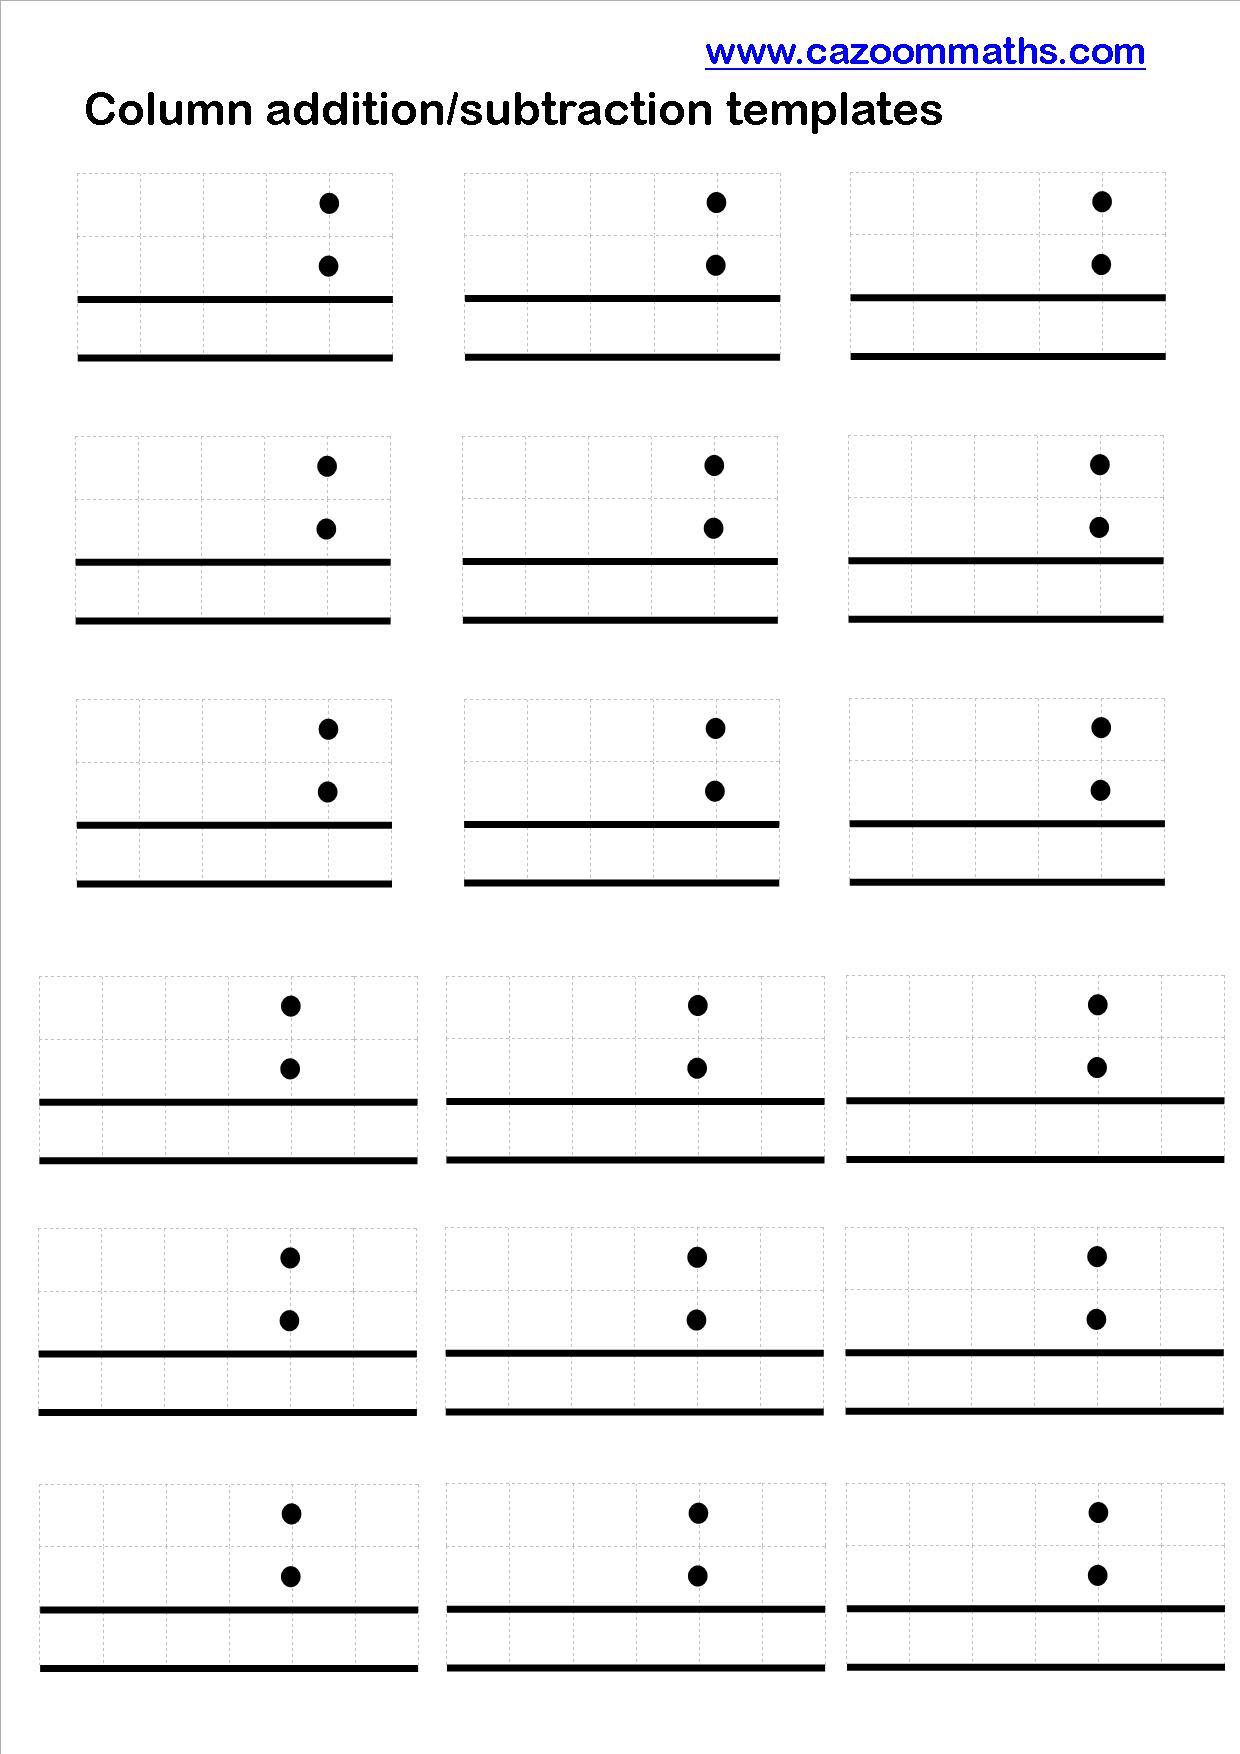 adding and subtracting decimals column templates teaching pinterest fun math worksheets. Black Bedroom Furniture Sets. Home Design Ideas